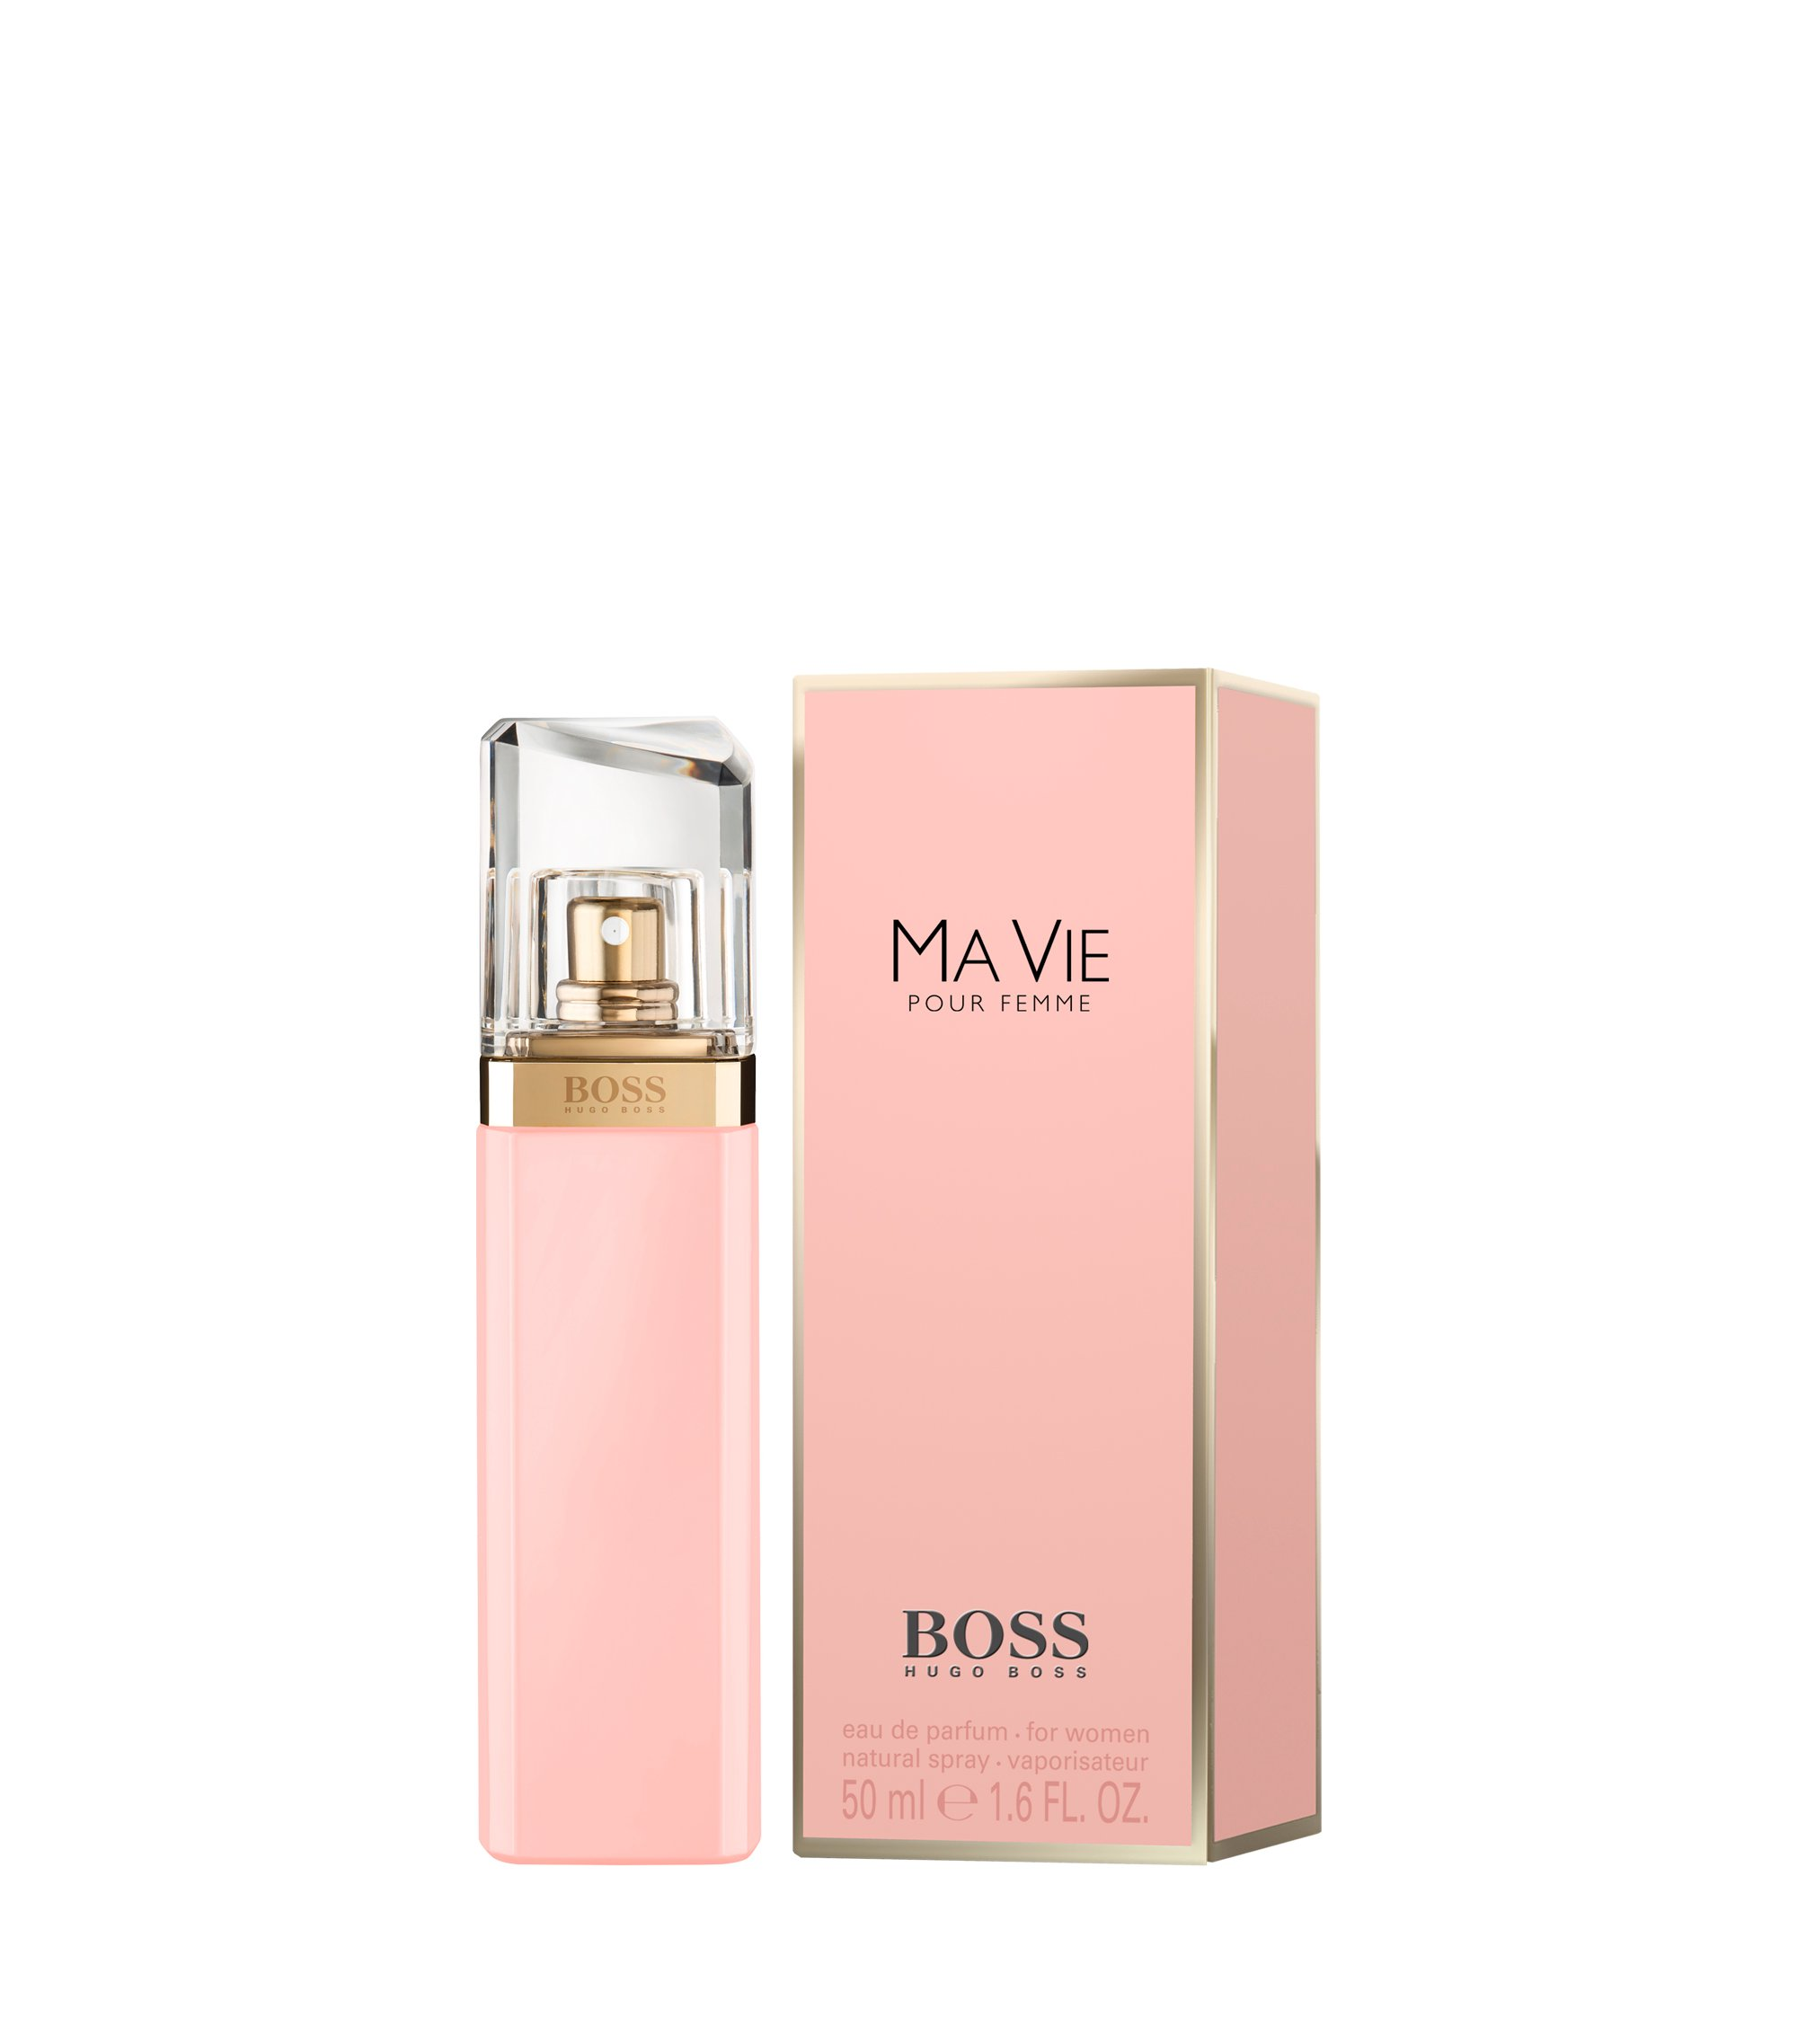 Eau de parfum BOSS Ma Vie pour femme da 50ml, Assorted-Pre-Pack